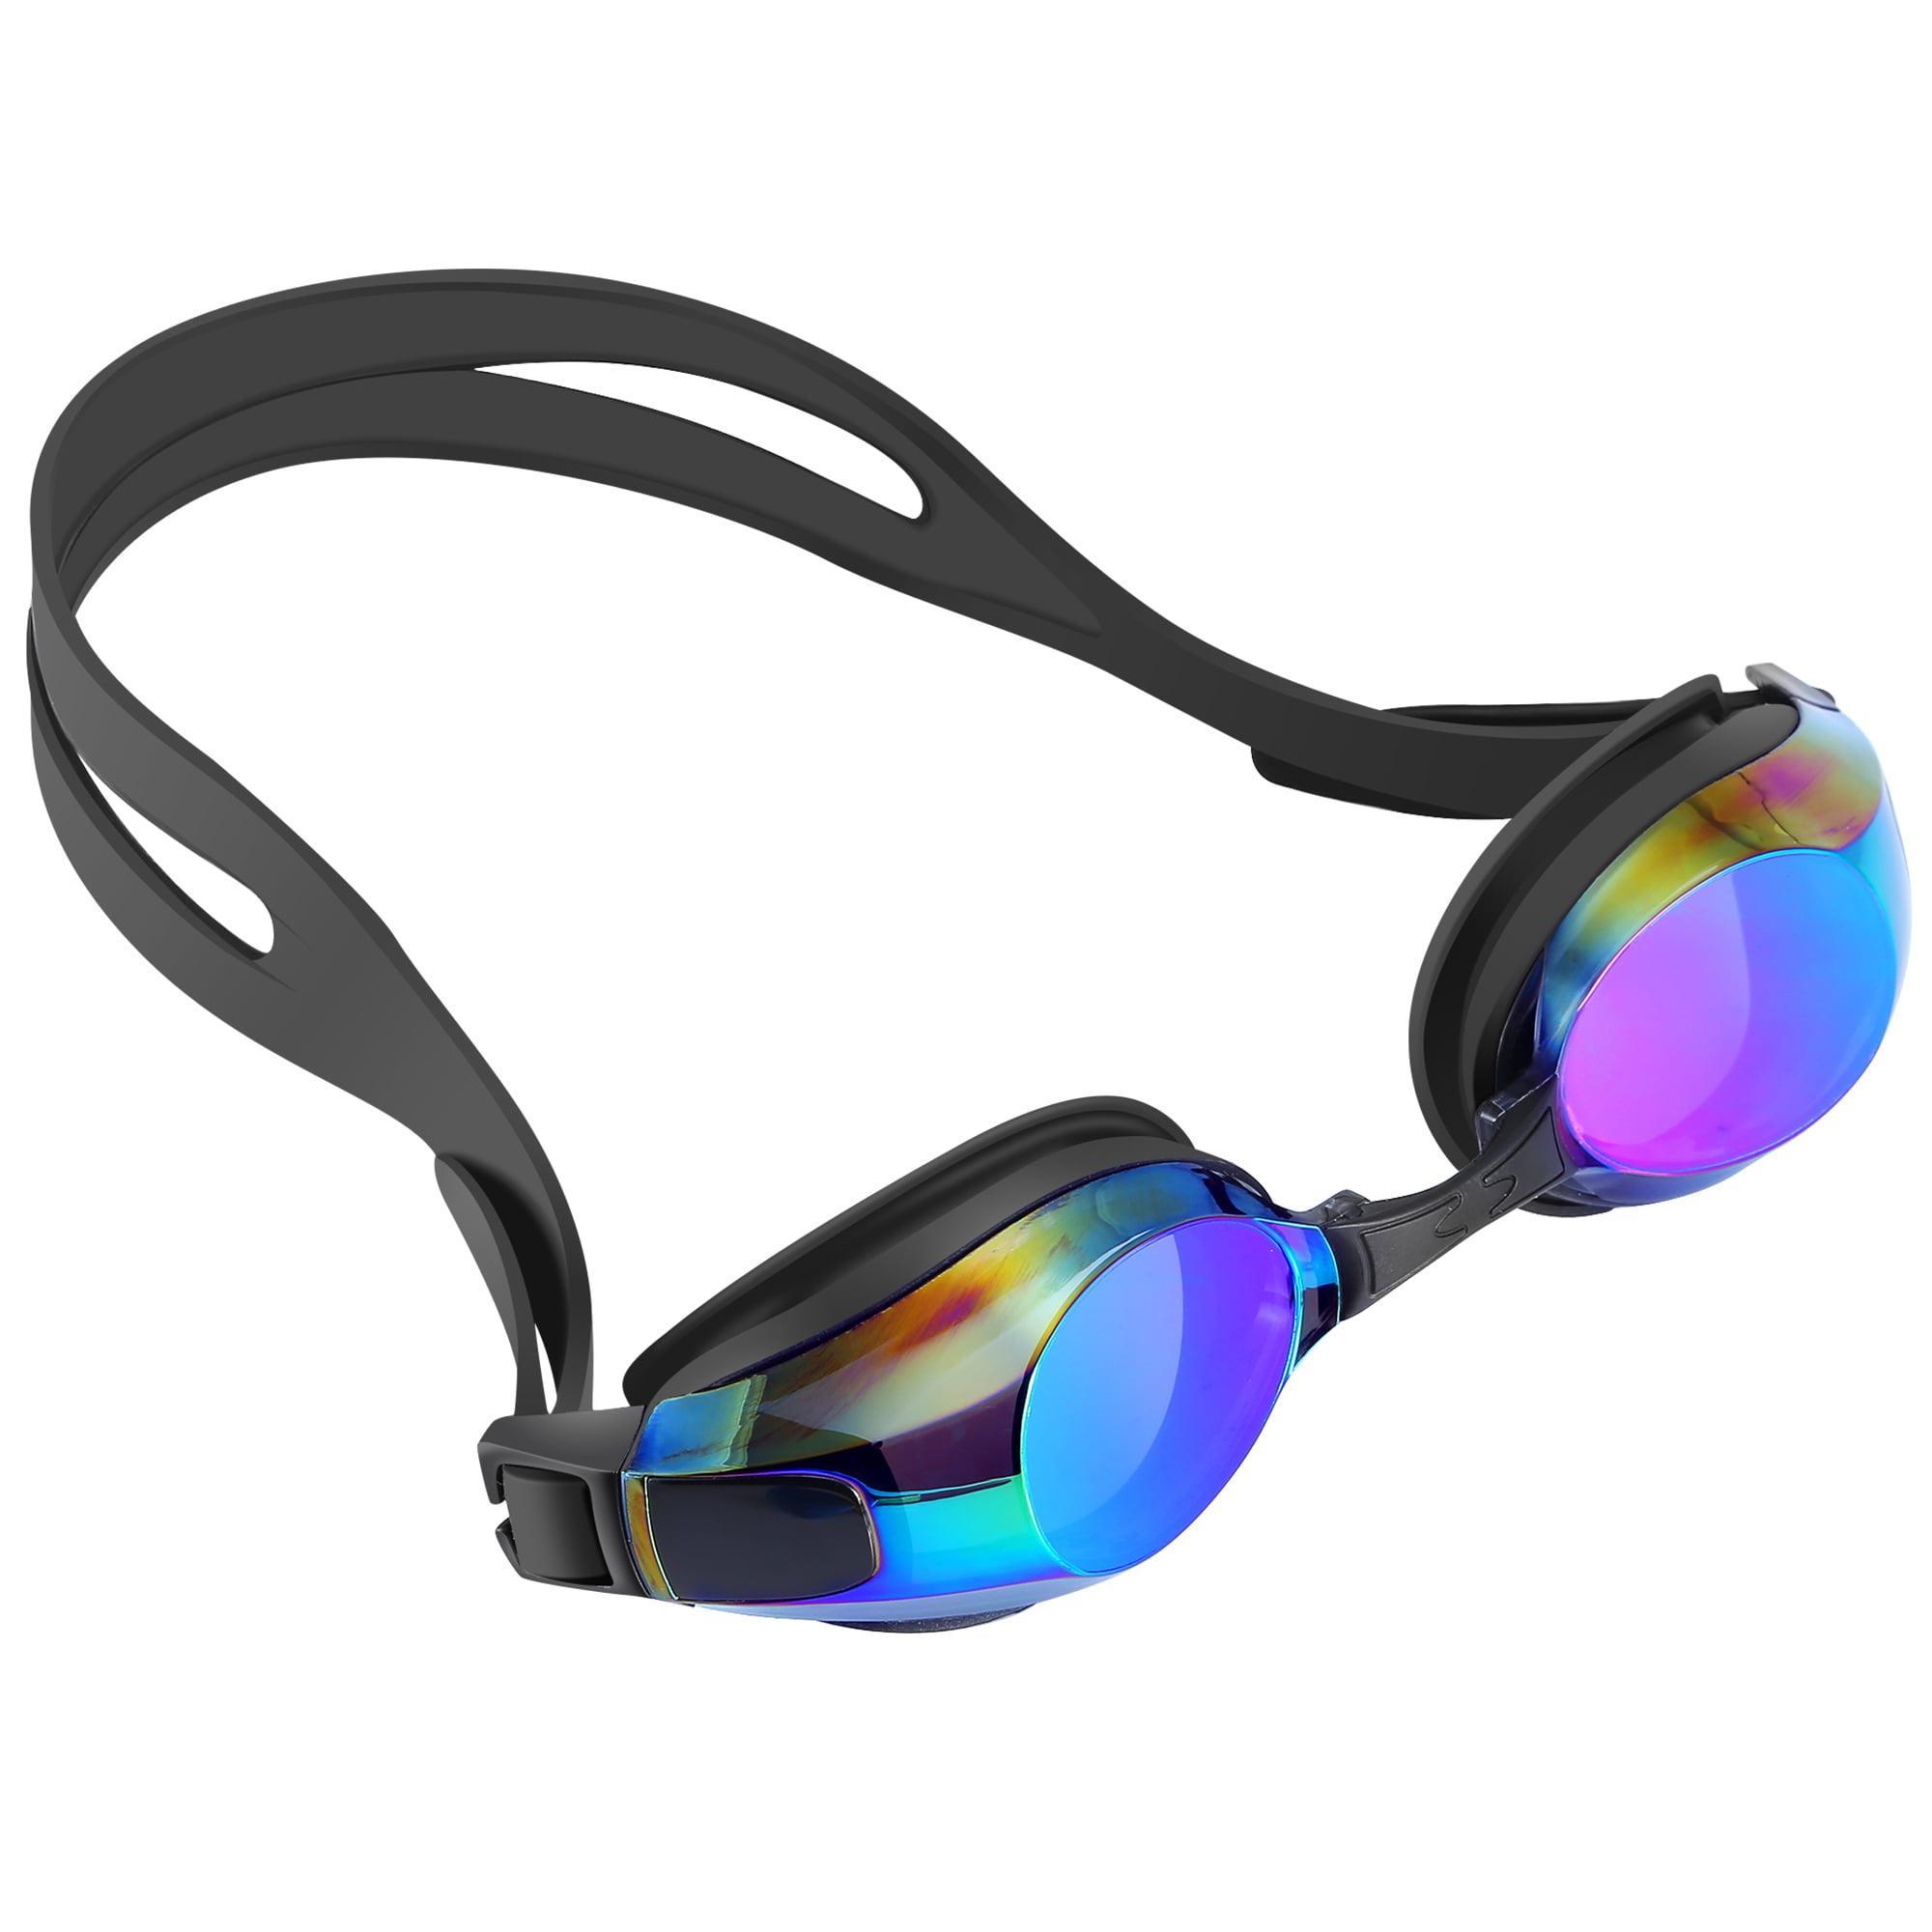 IPOW Swimming Goggles Glasses for Adults Men Women Kids Girls Boys Children Youth,Fog-Free Swim Goggles Waterproof Swimming Goggle Glass with No-Leaking Eye Gaskets for Swimming Pool Sea triathlon